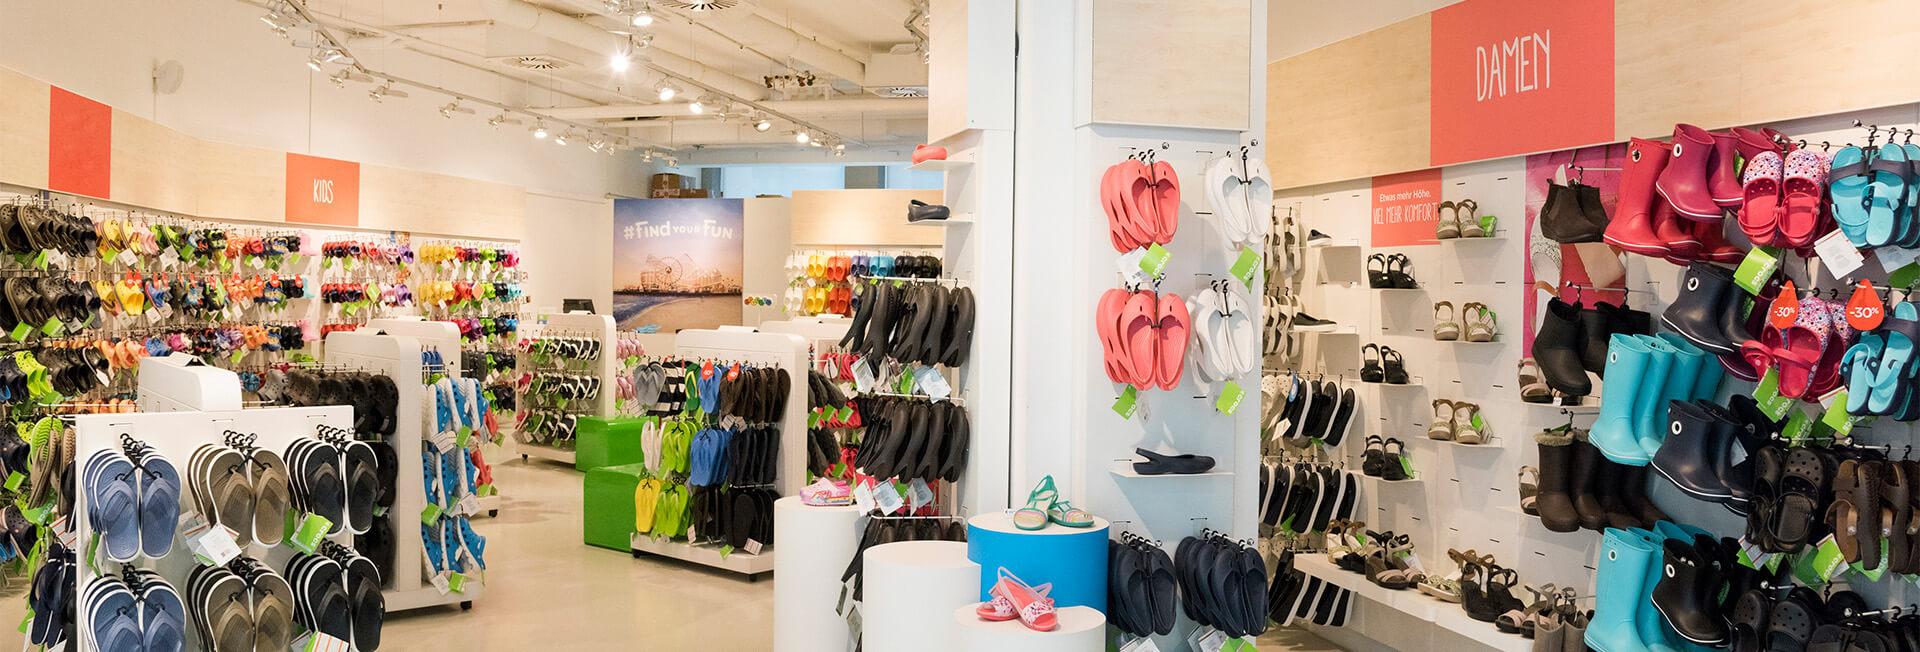 Crocs-Store-Kaufhaus-Tyrol